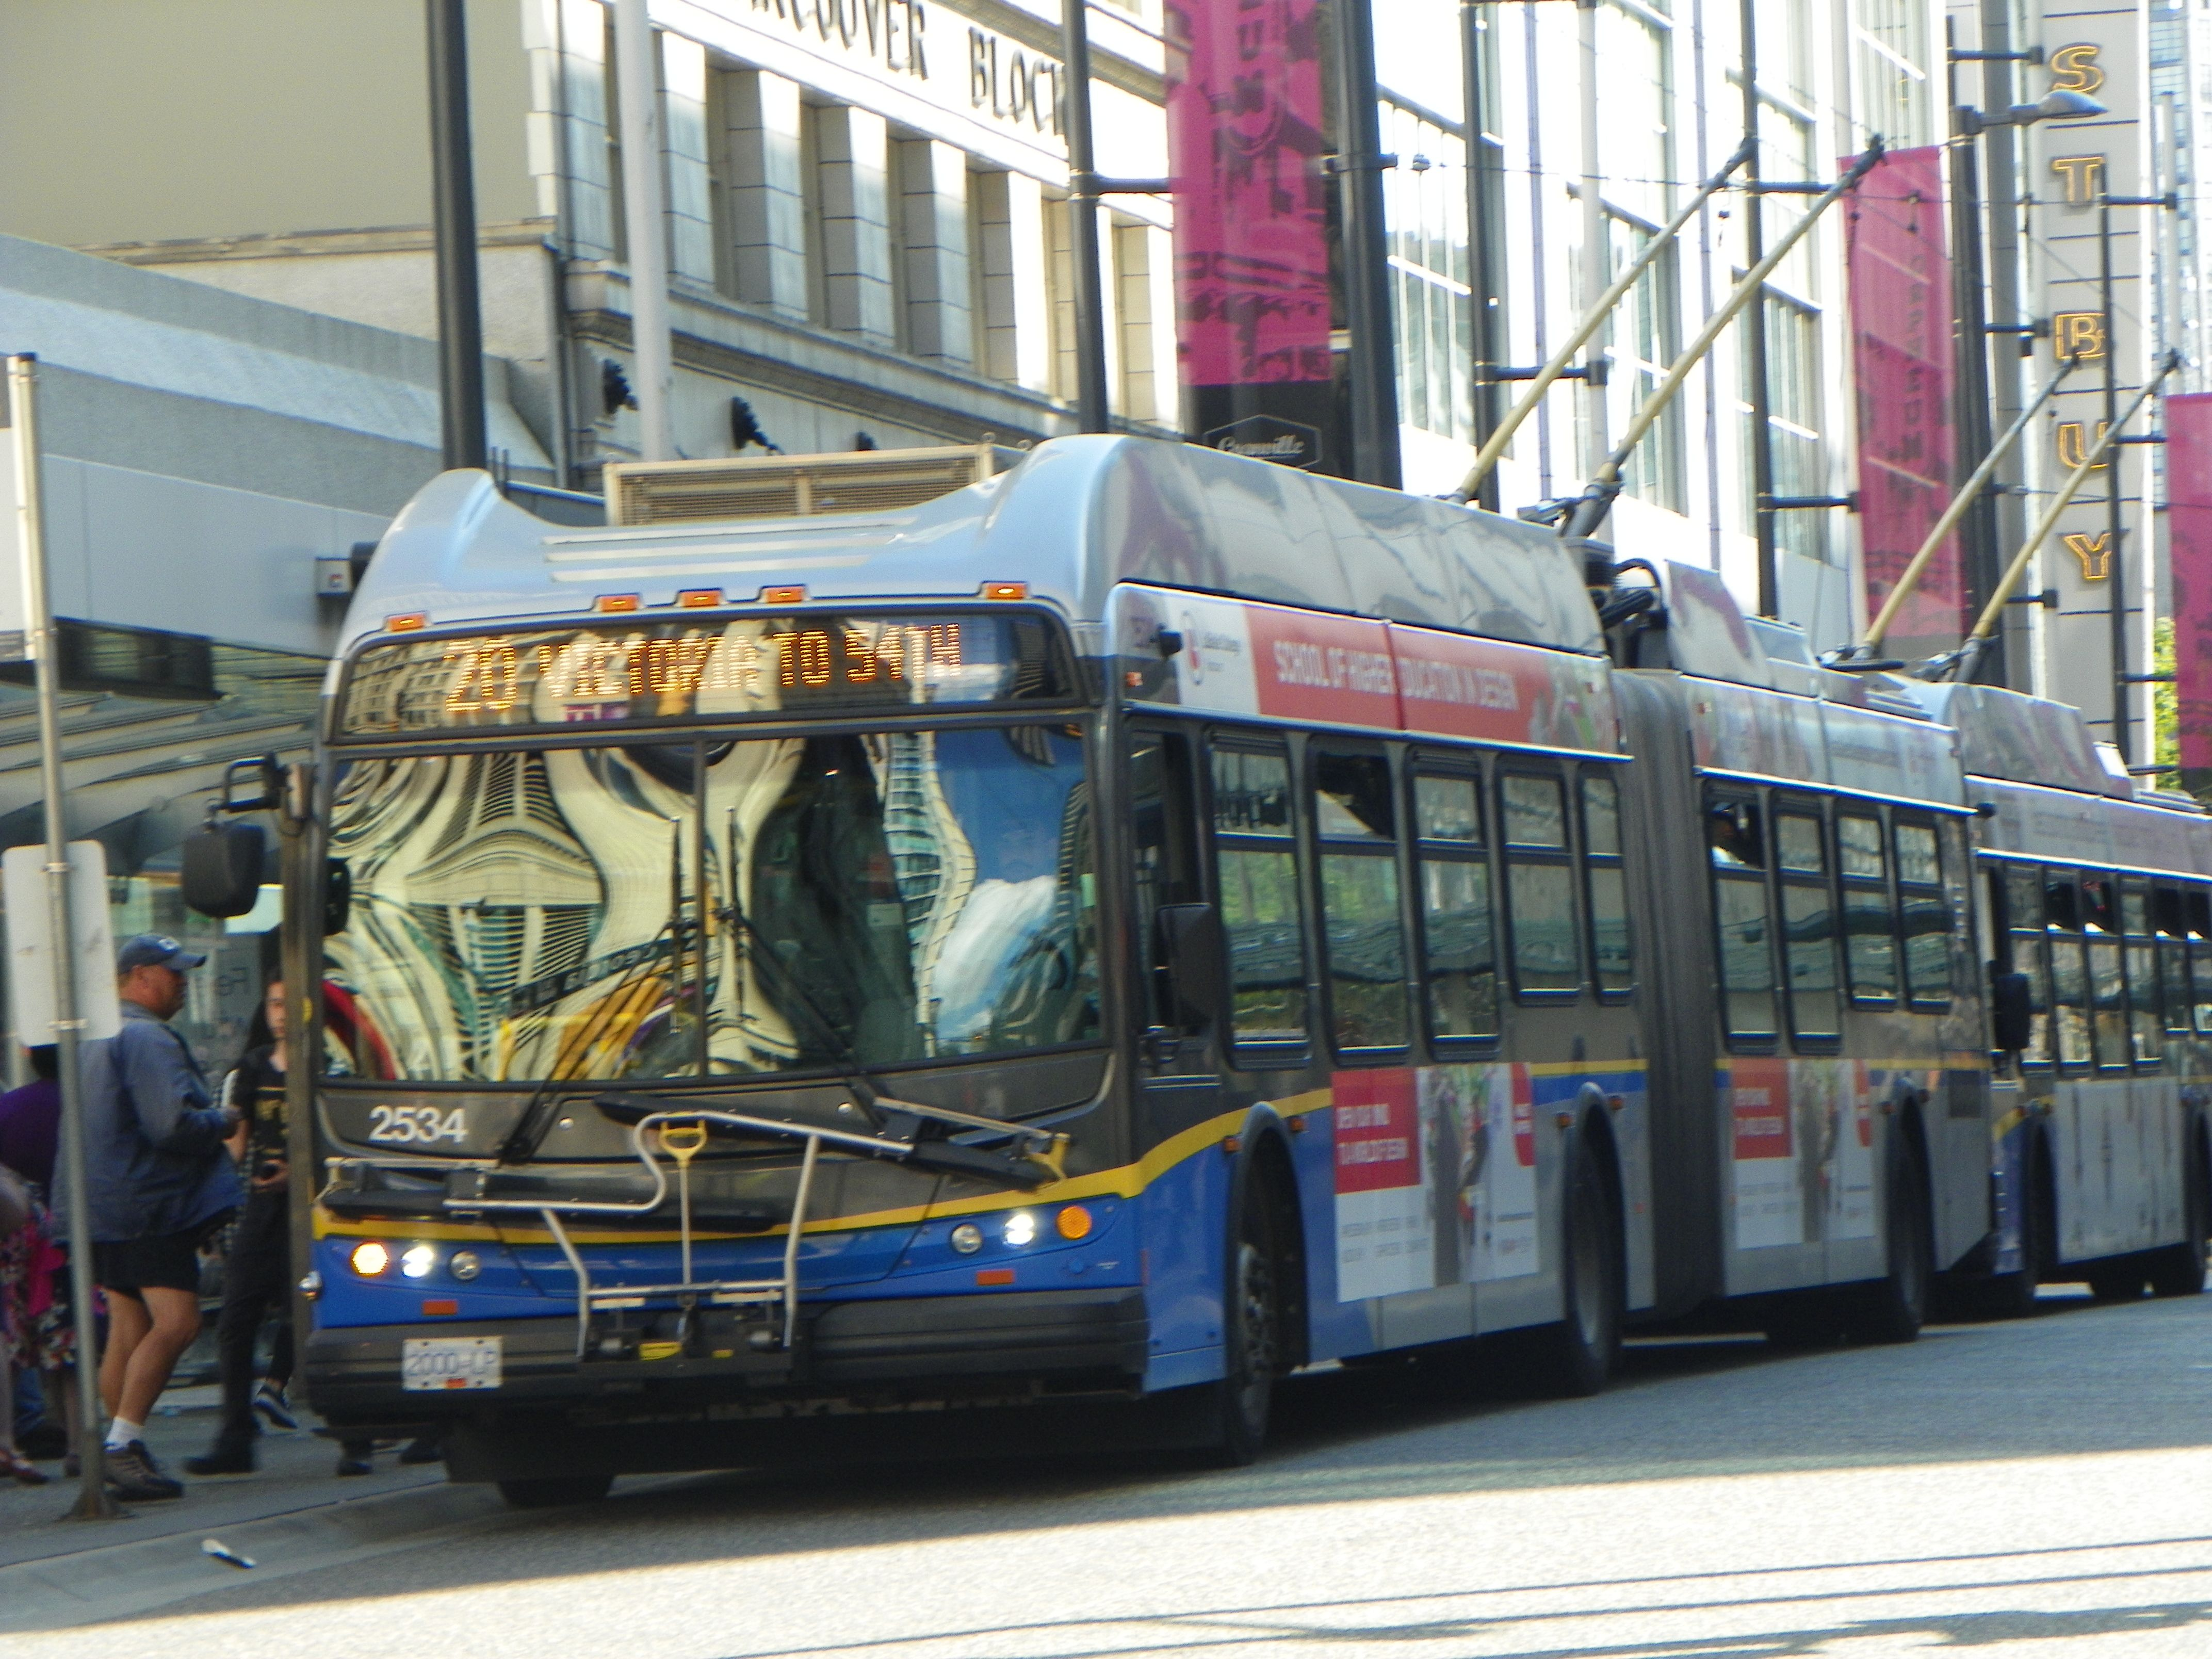 All sizes Coast Mountain Bus Company 2534 Flickr